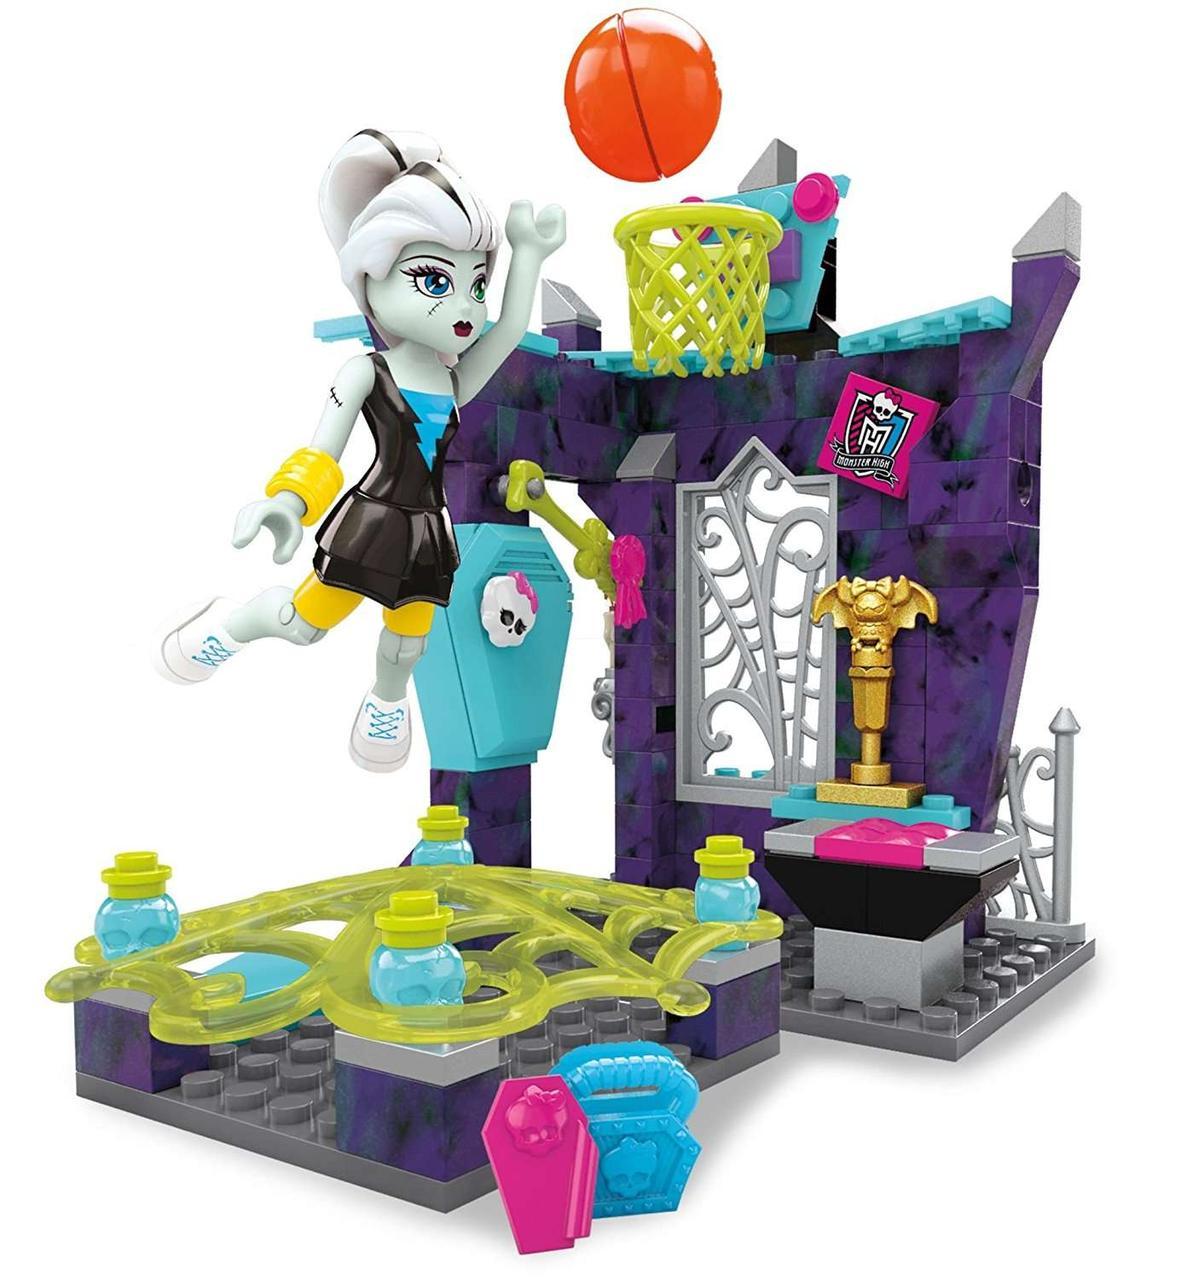 "Конструктор ""Спортомания"" Monster High Mega Bloks, мегаблокс, мега блокс монтер хай, megabloks (137 дет.) - Интернет-магазин "" Toyexpress "" в Днепре"